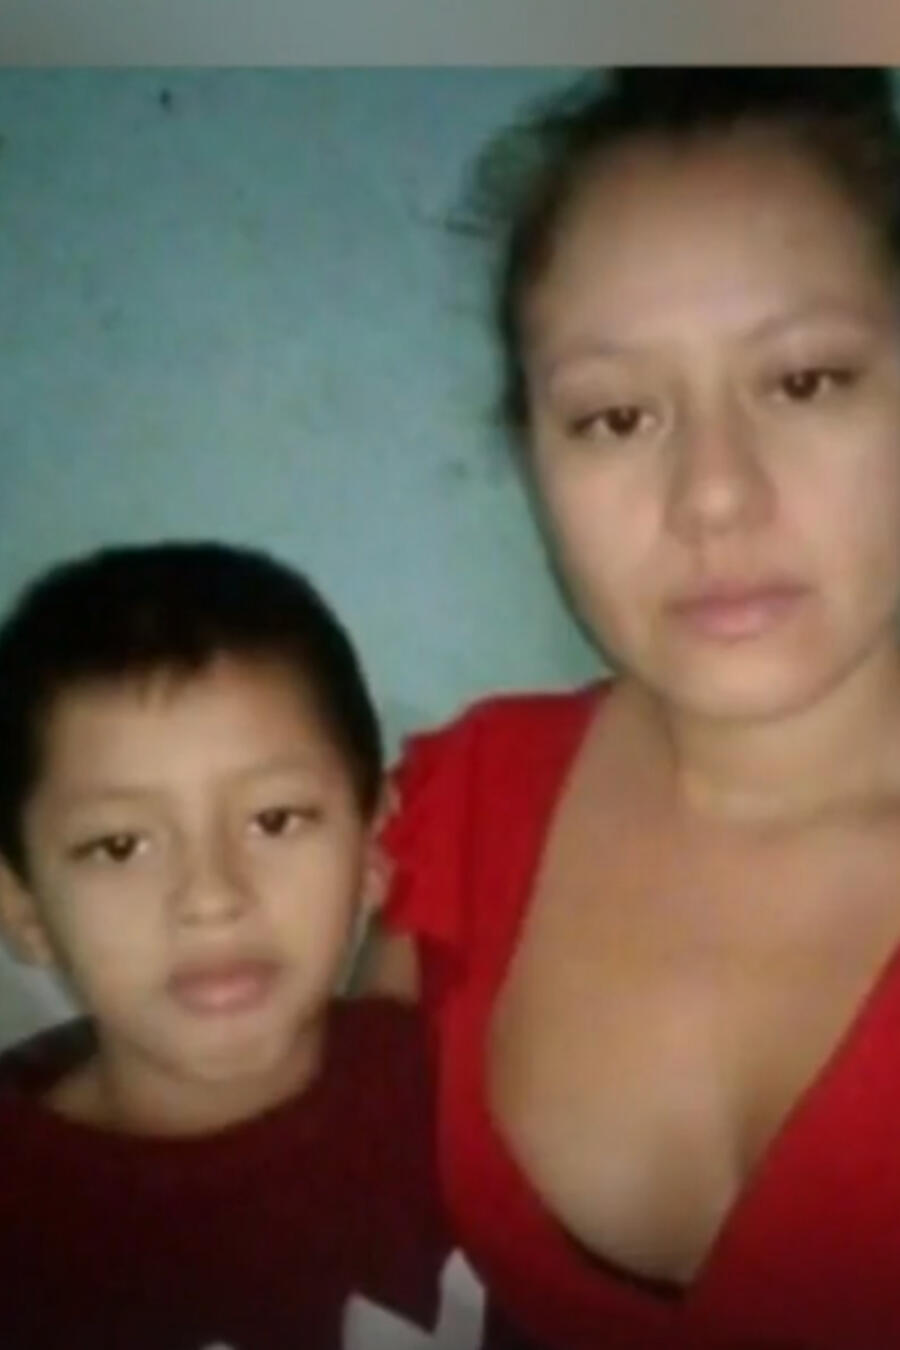 Wilton Gutiérrez y su madre, Meyling Obregón Leiva